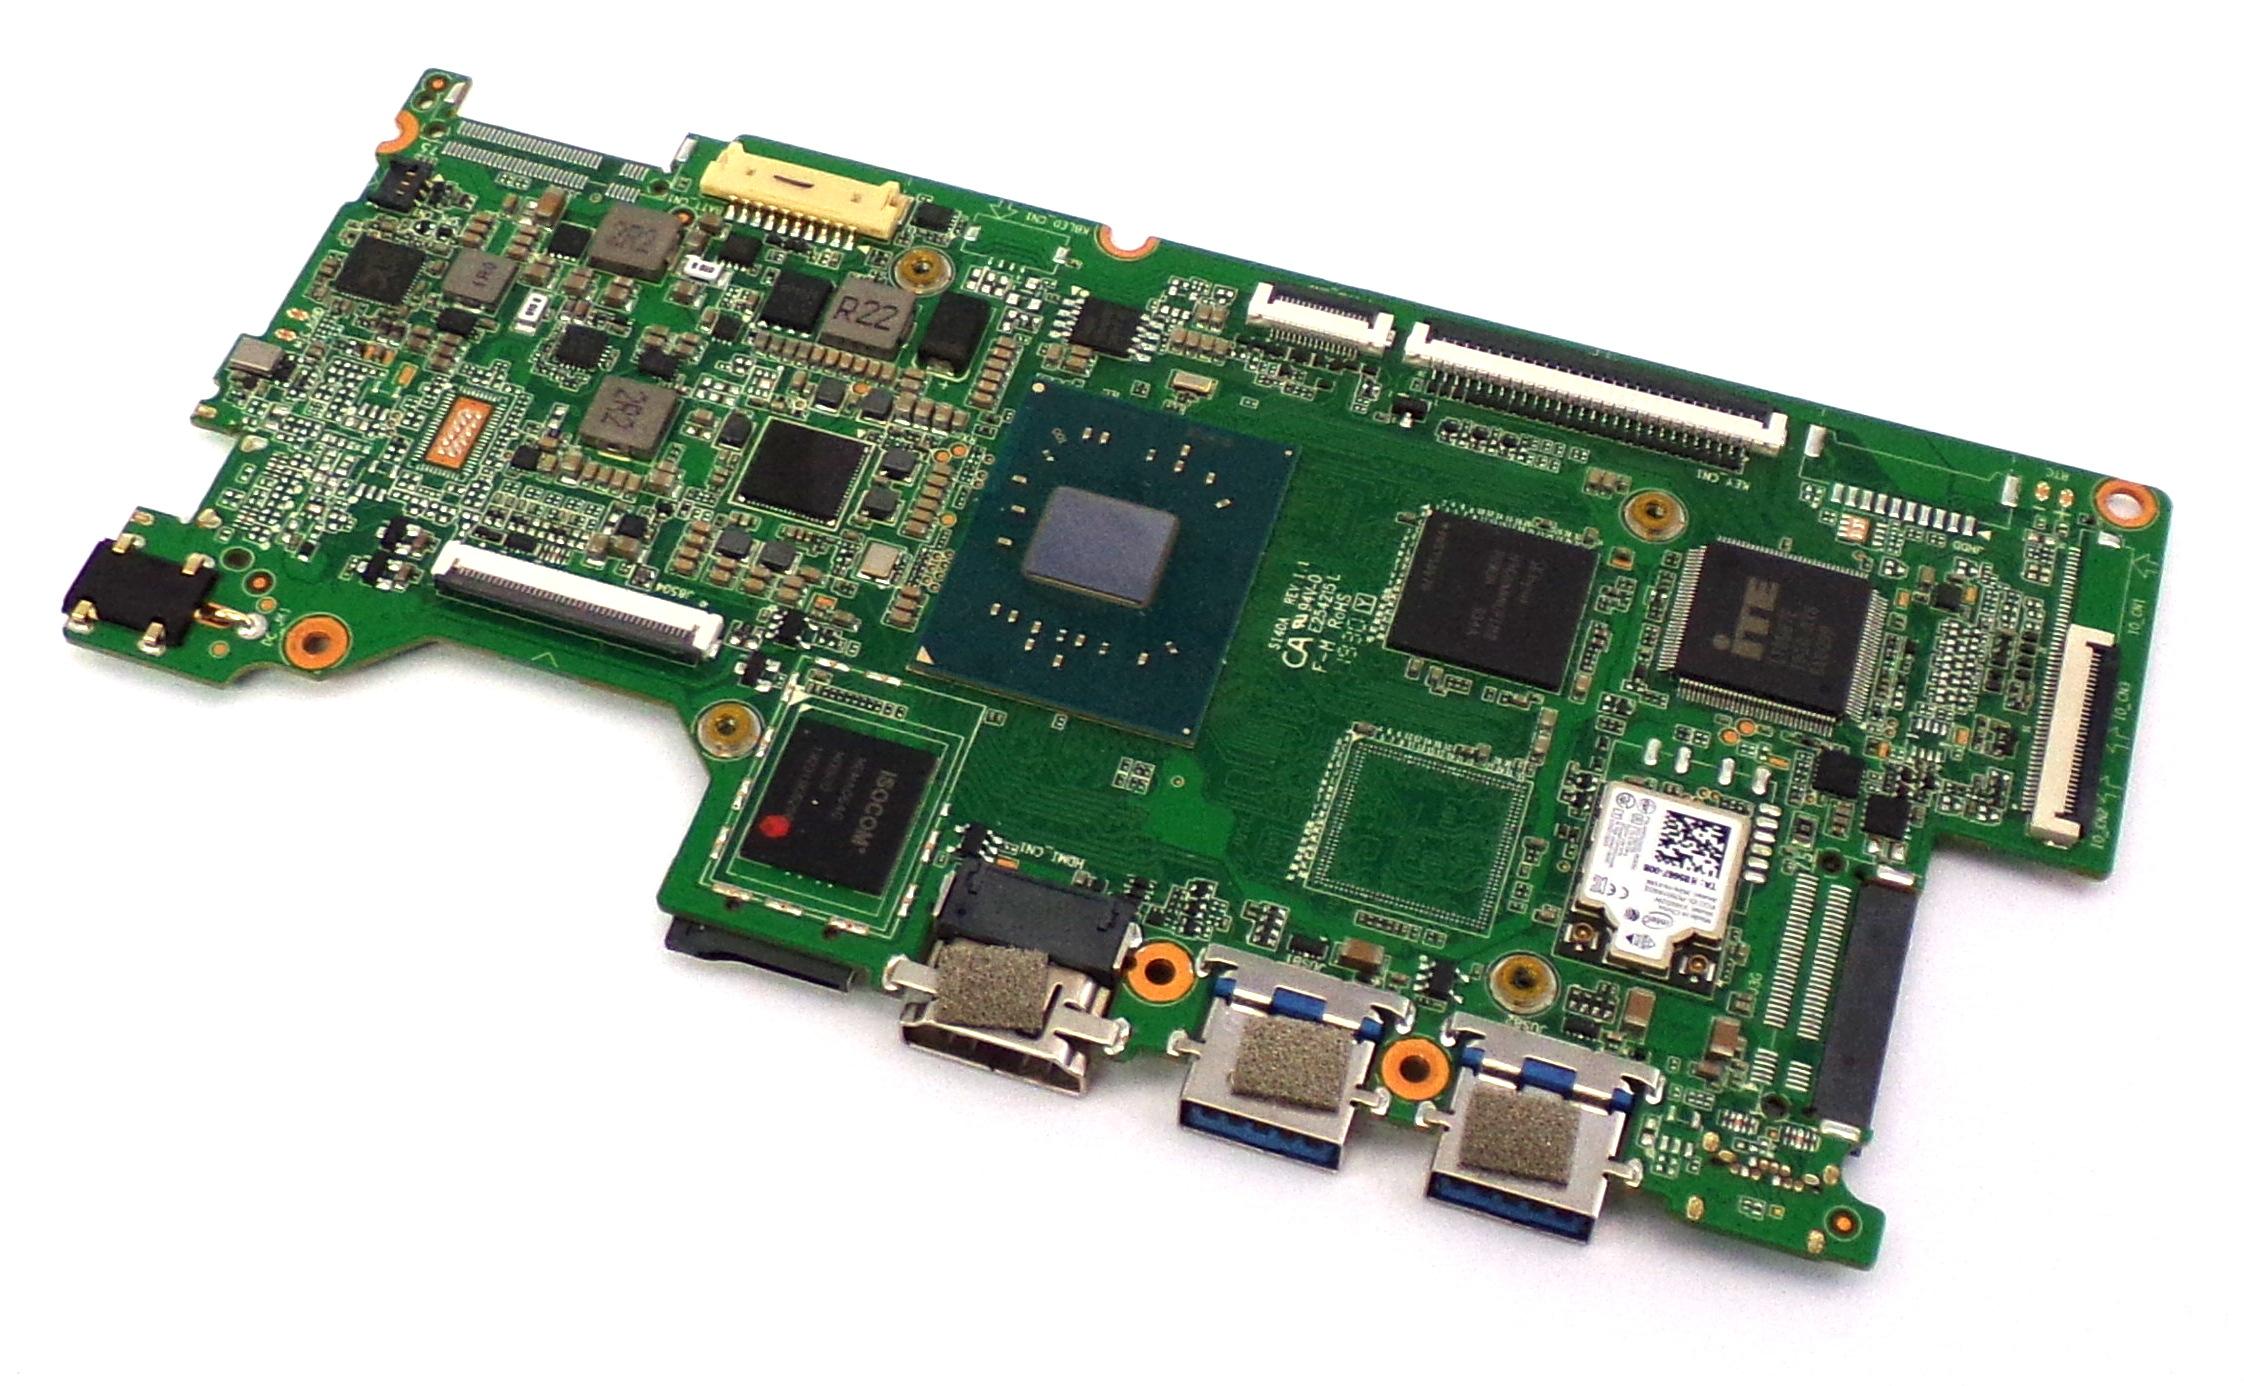 S140AR110 GeoBook 3X with Intel Celeron N4200 64GB eMMC Laptop Motherboard